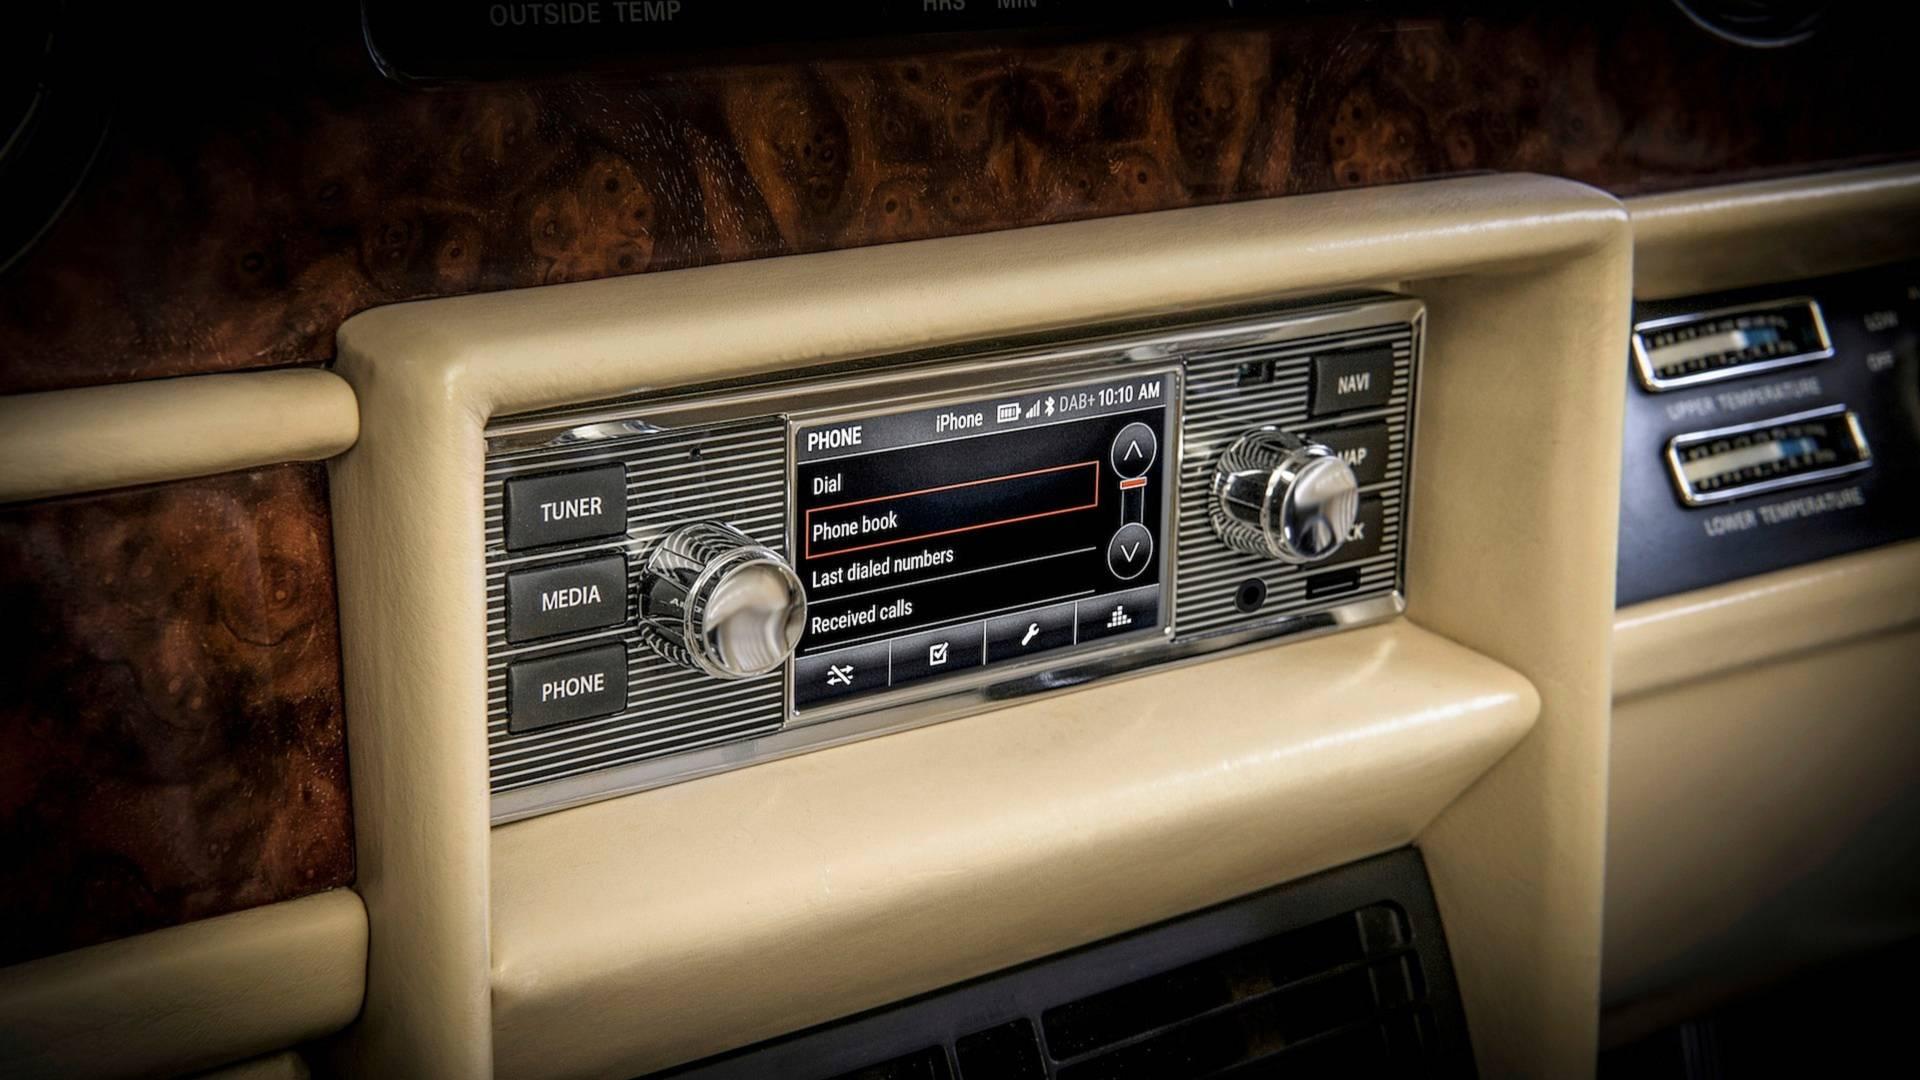 jaguar-land-rover-classic-infotainment-system (2)